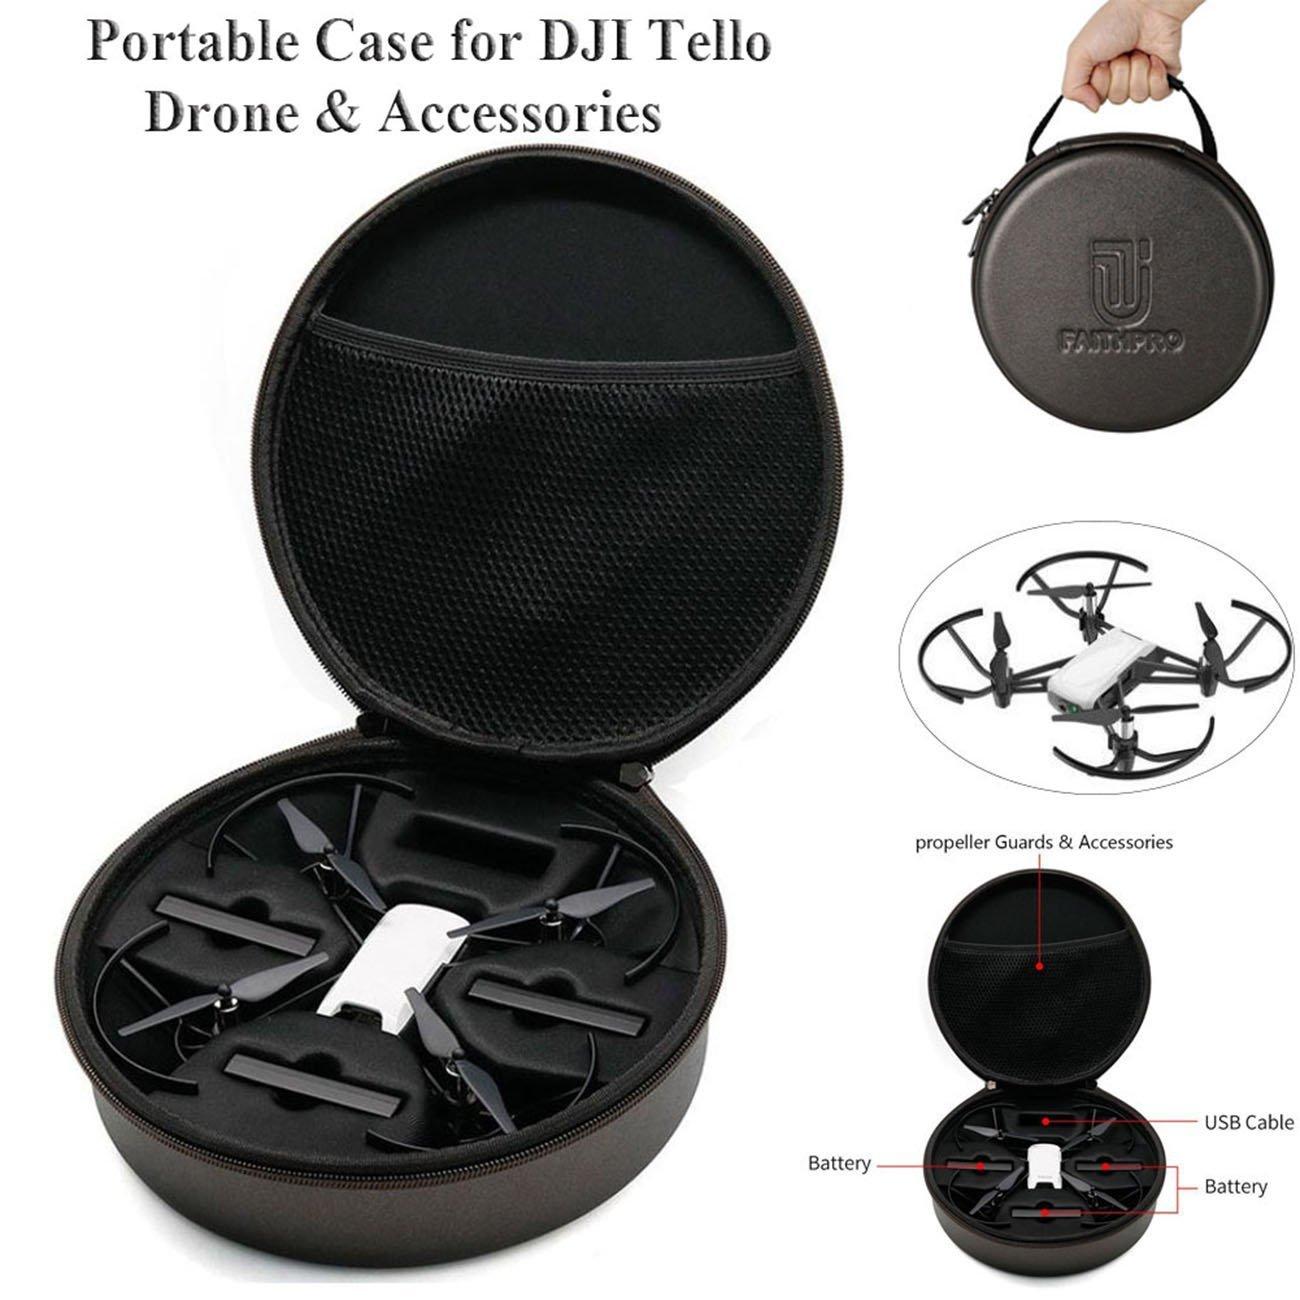 Crazepony-UK DJI Tello Drone Portable Estuche,Carrying Case Bag ...